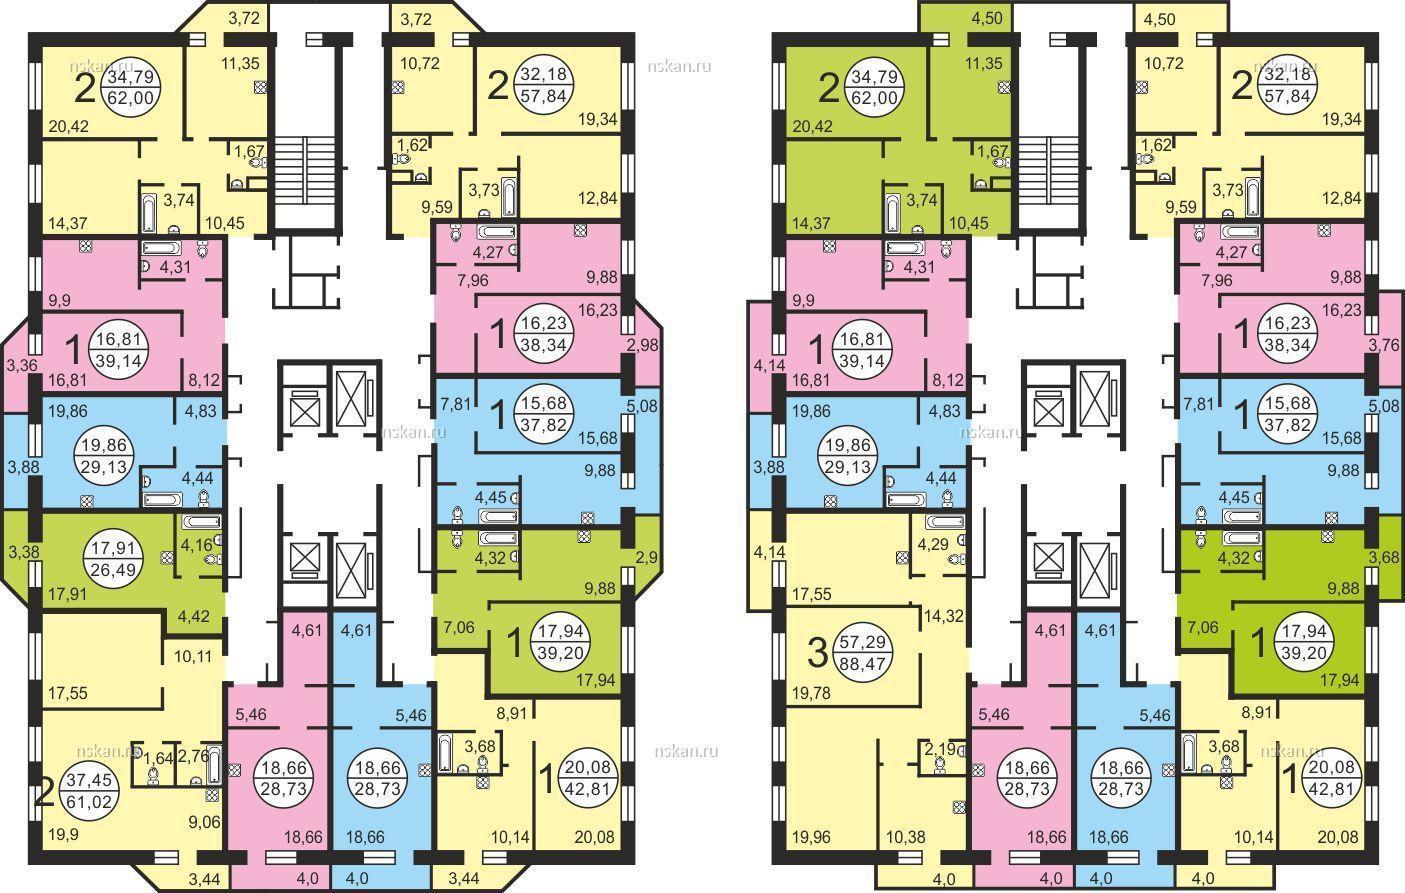 Quanto costa 4 appartamento a Pisa